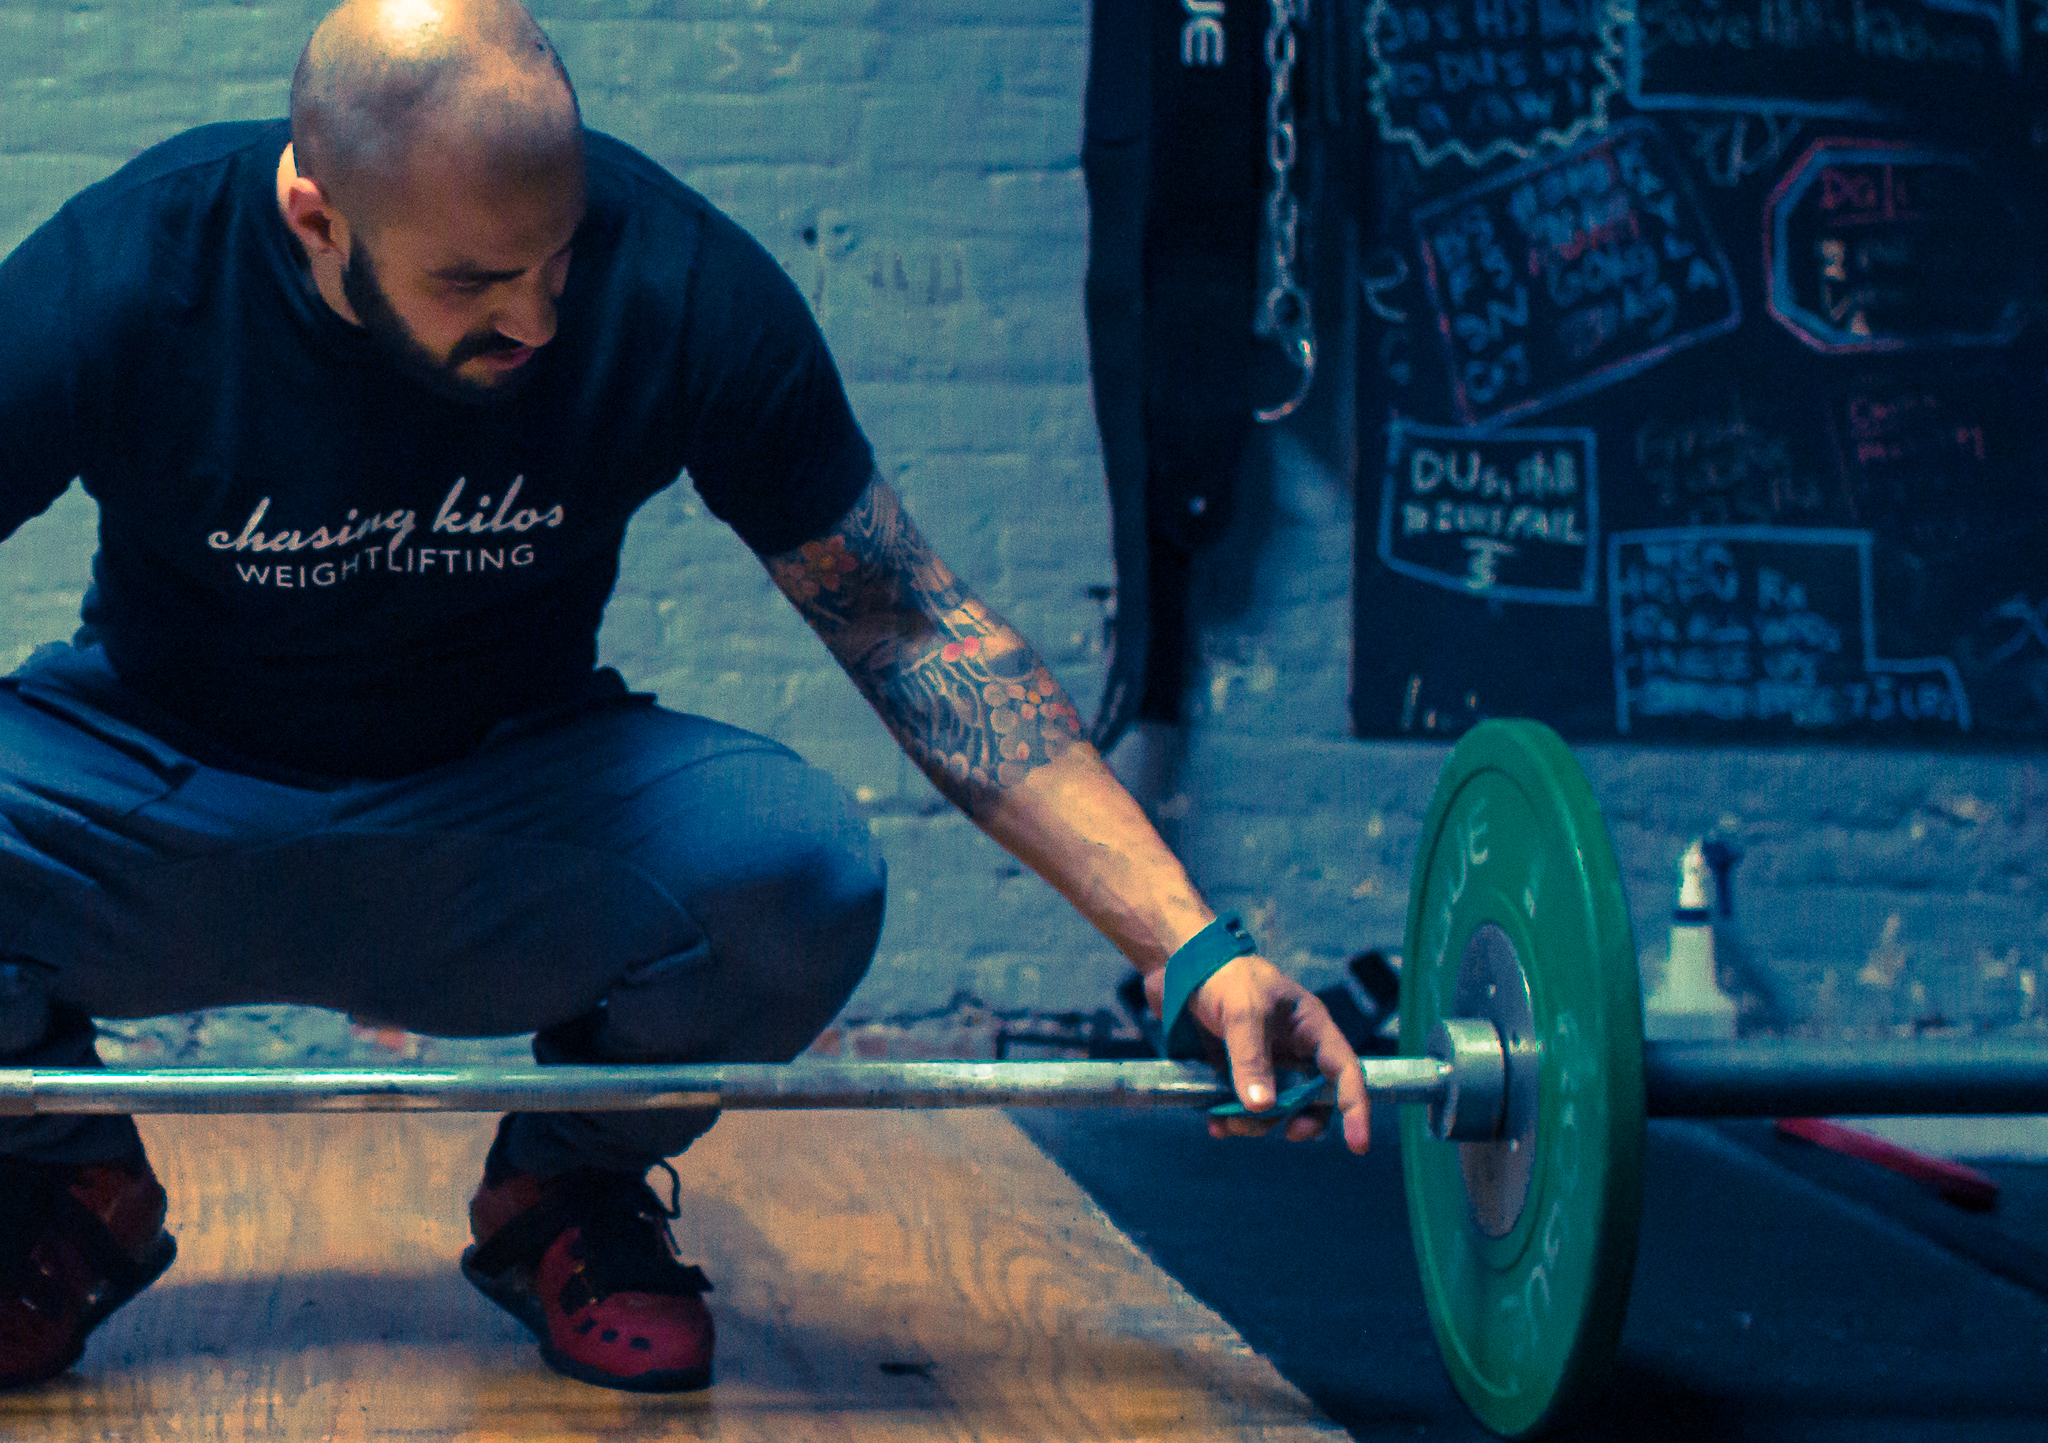 james-wright-visit-brooklyn-new-york-weightlifting-coach-teammates-october-2016 (47 of 92).jpg